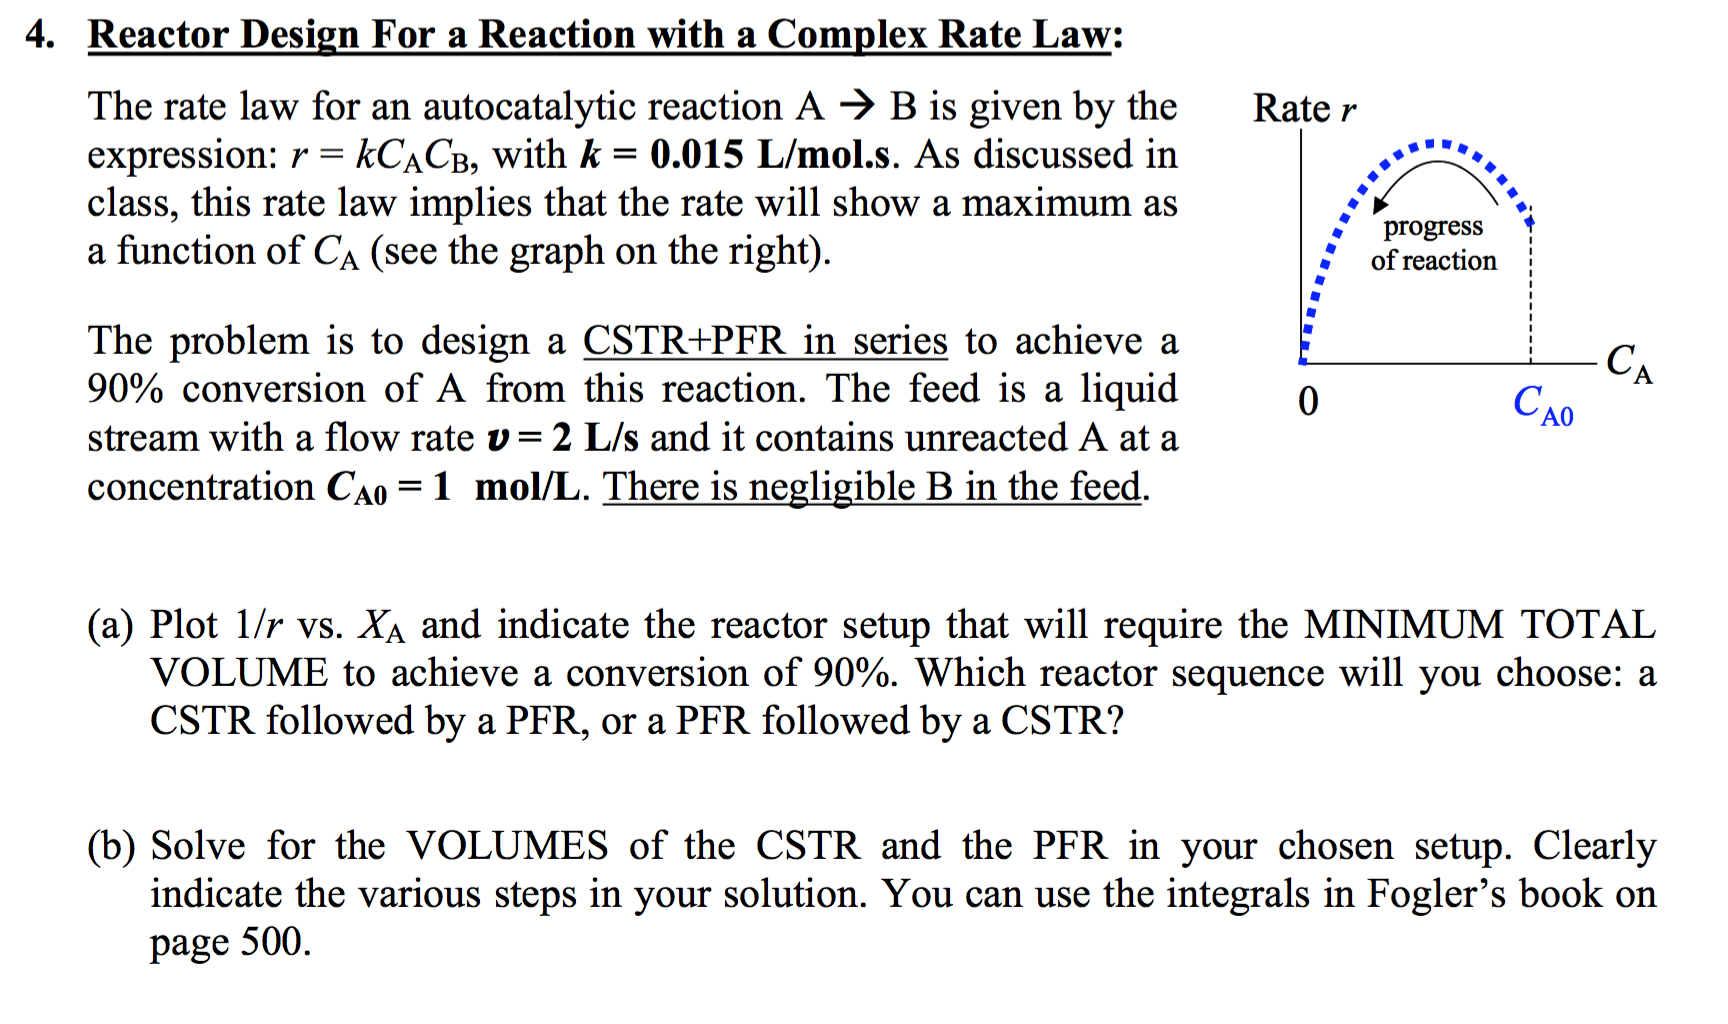 Reactor Design For A Reaction W A Complex Rate La Cheggcom - Cstr reactor design